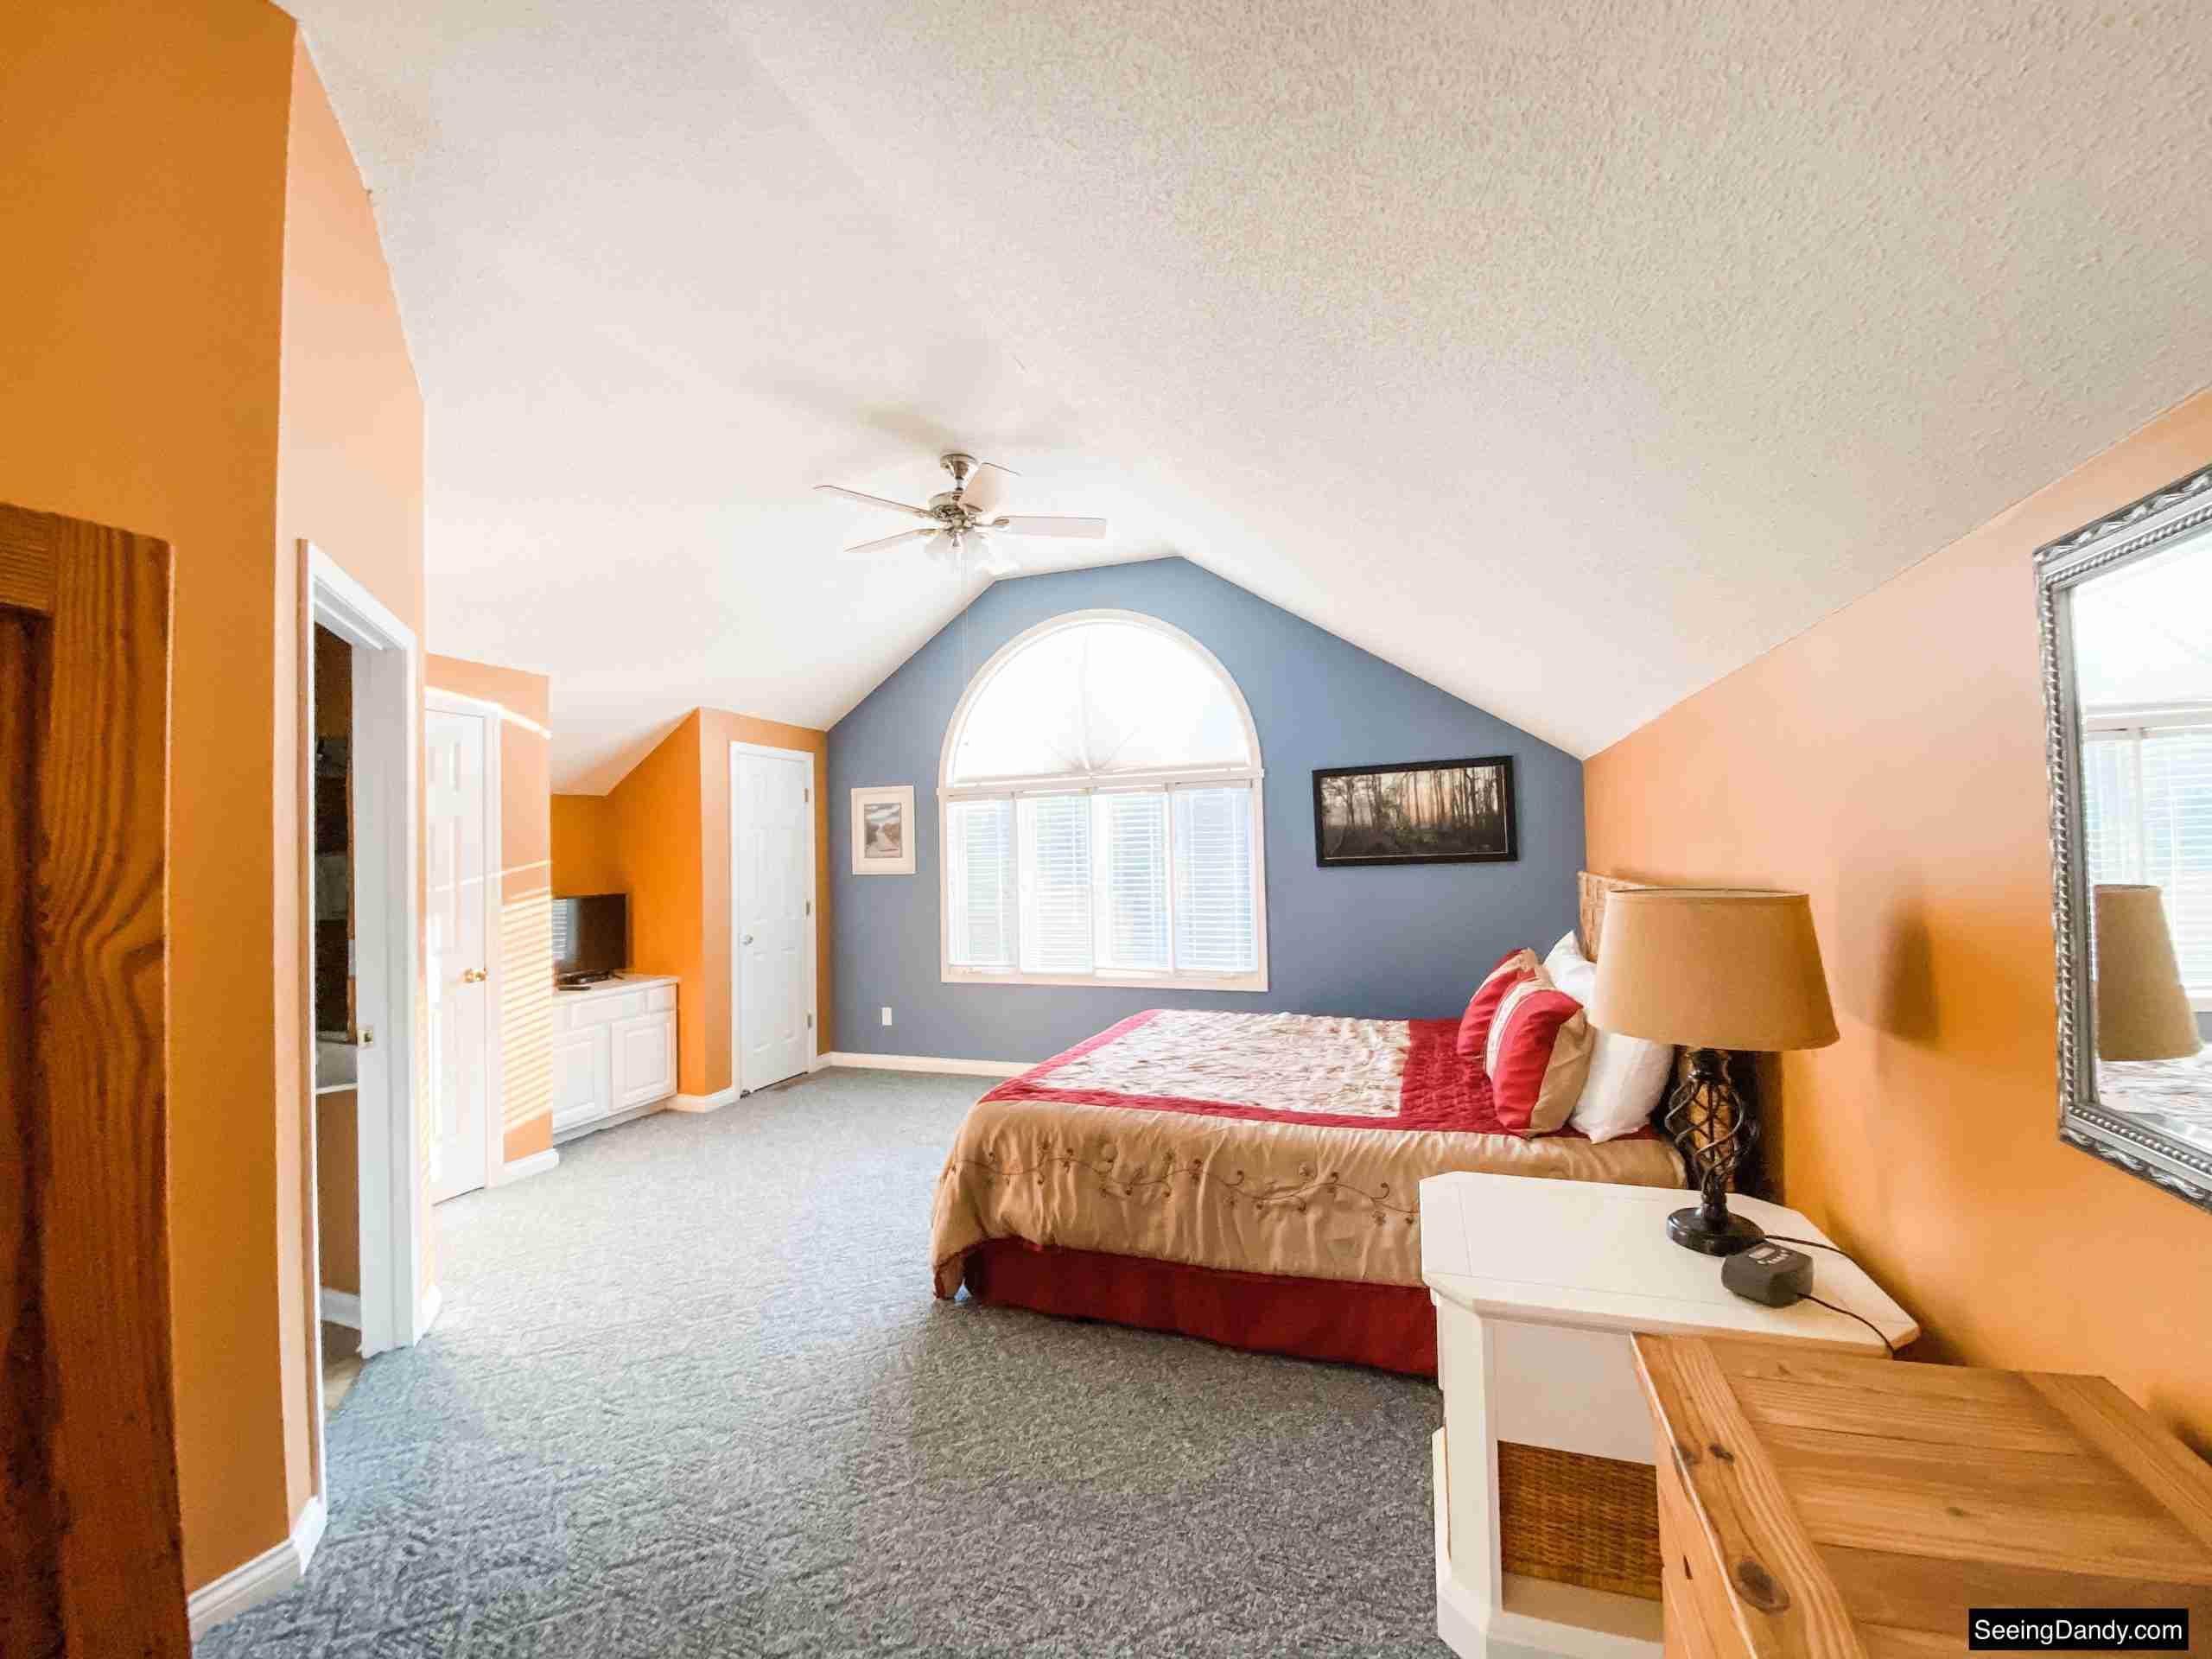 green turtle bay condo, elliebelle condo, condo master bedroom, nautical decor